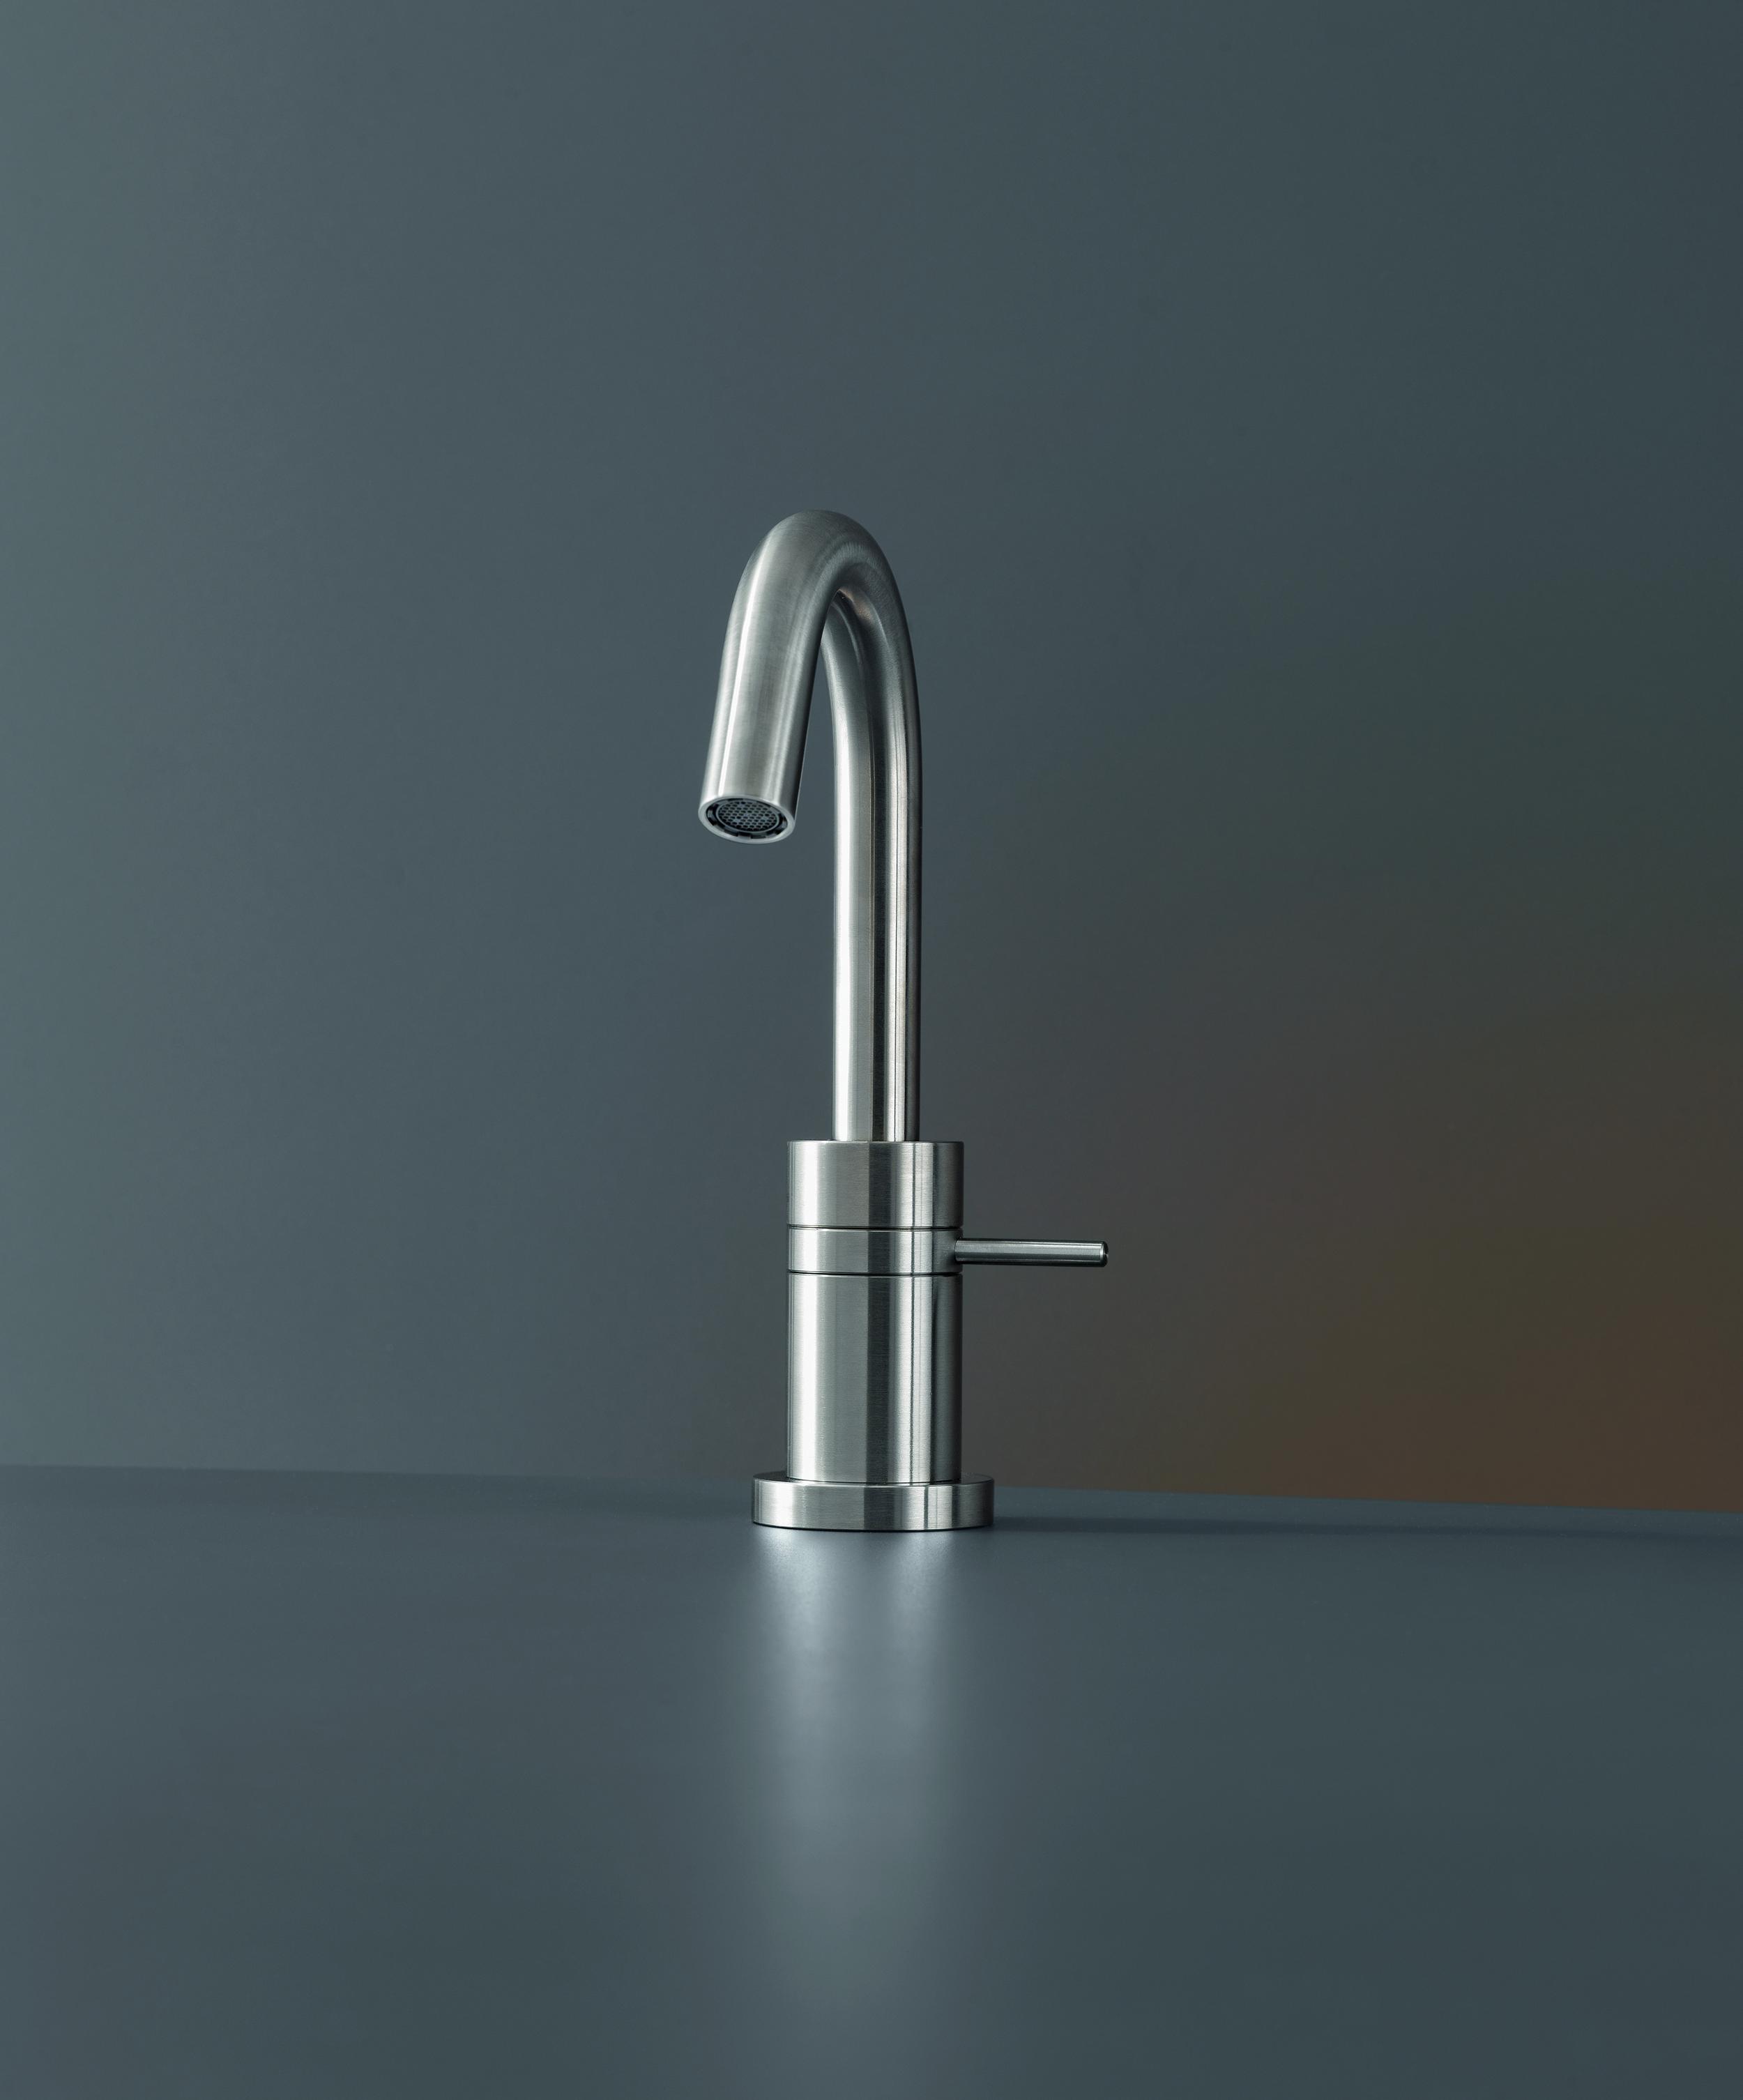 Contemporary Gradi Deck Mount Faucet | Hydrology